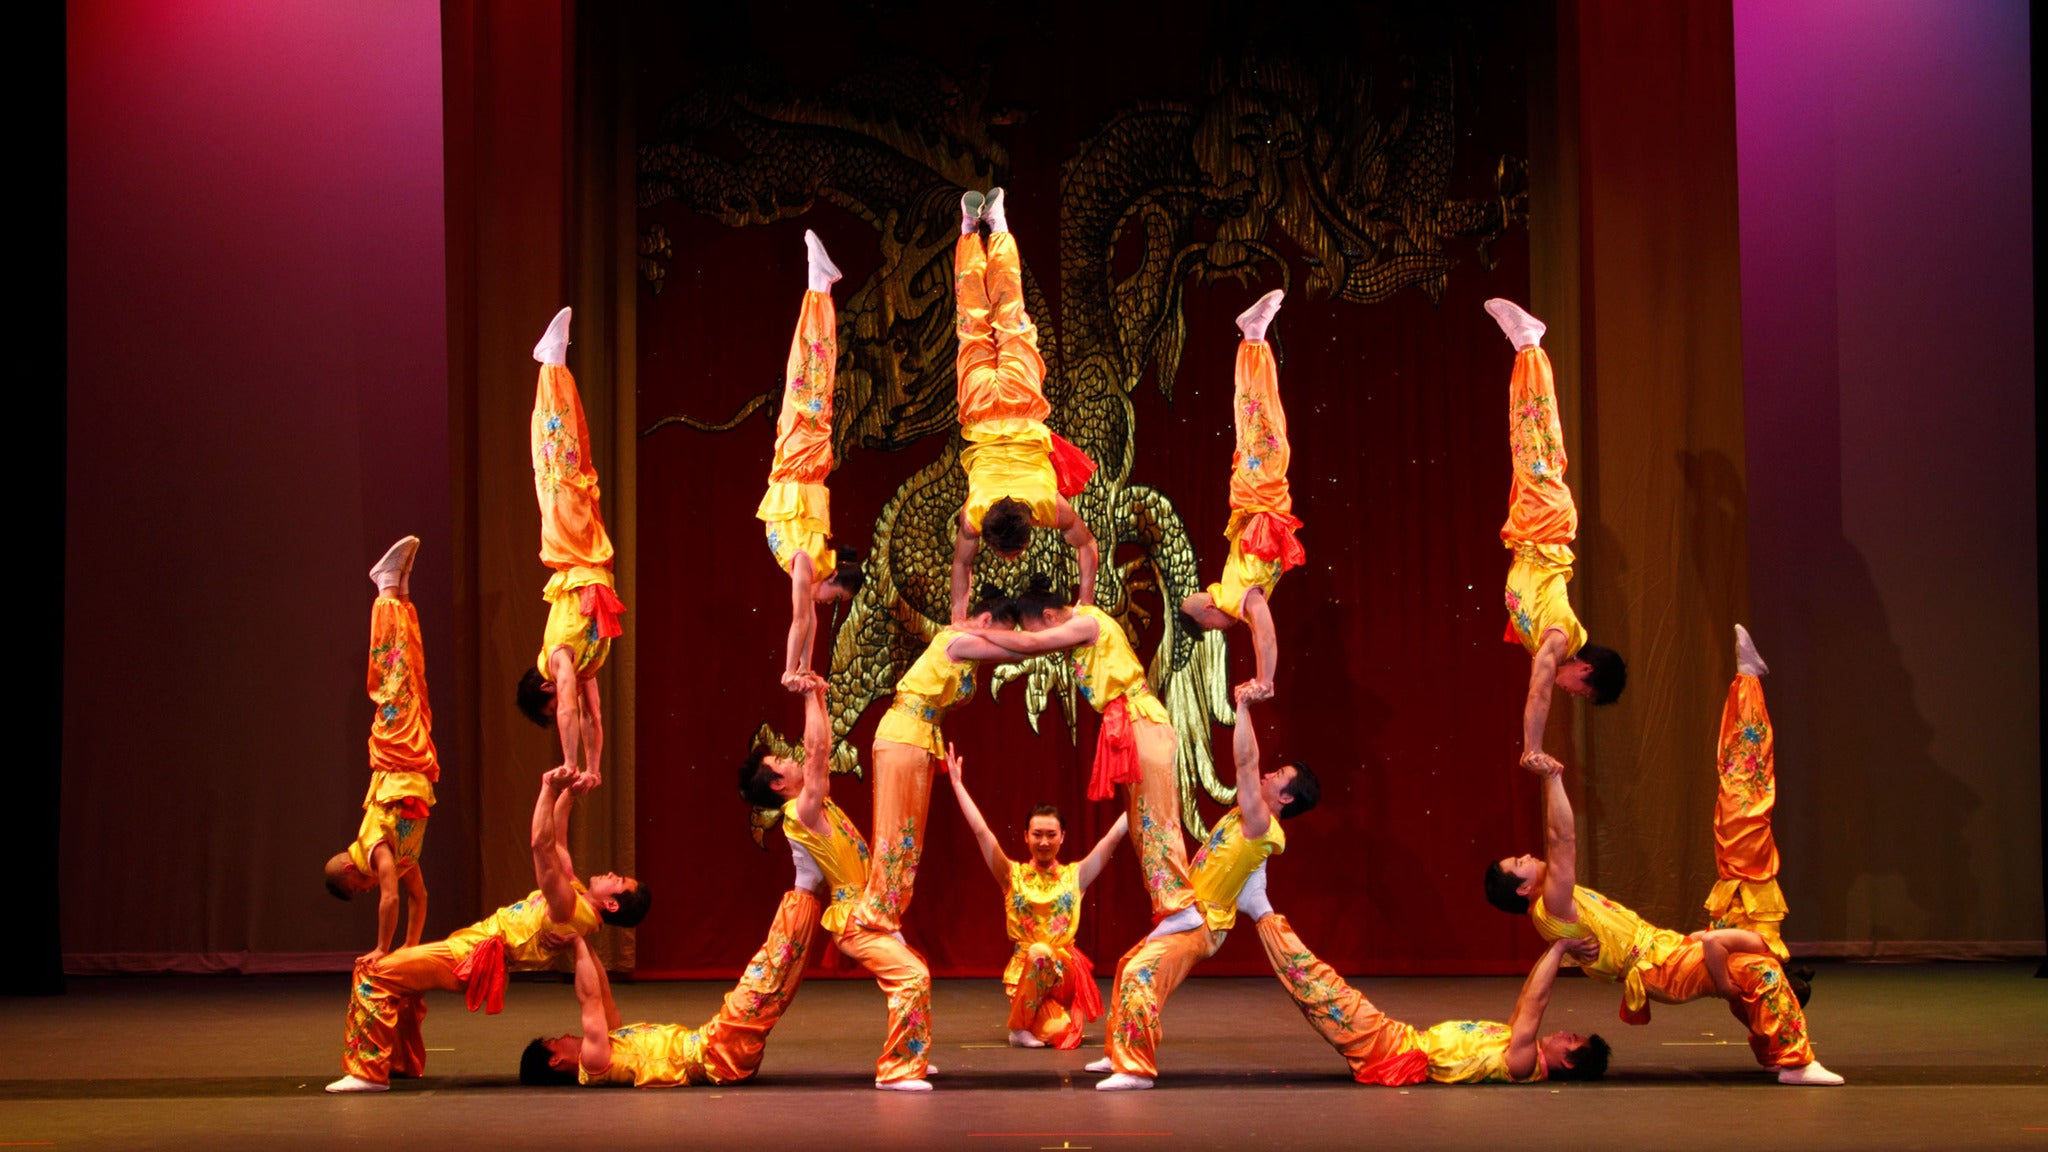 Peking Acrobats at Community Theatre-NJ - Morristown, NJ 07960